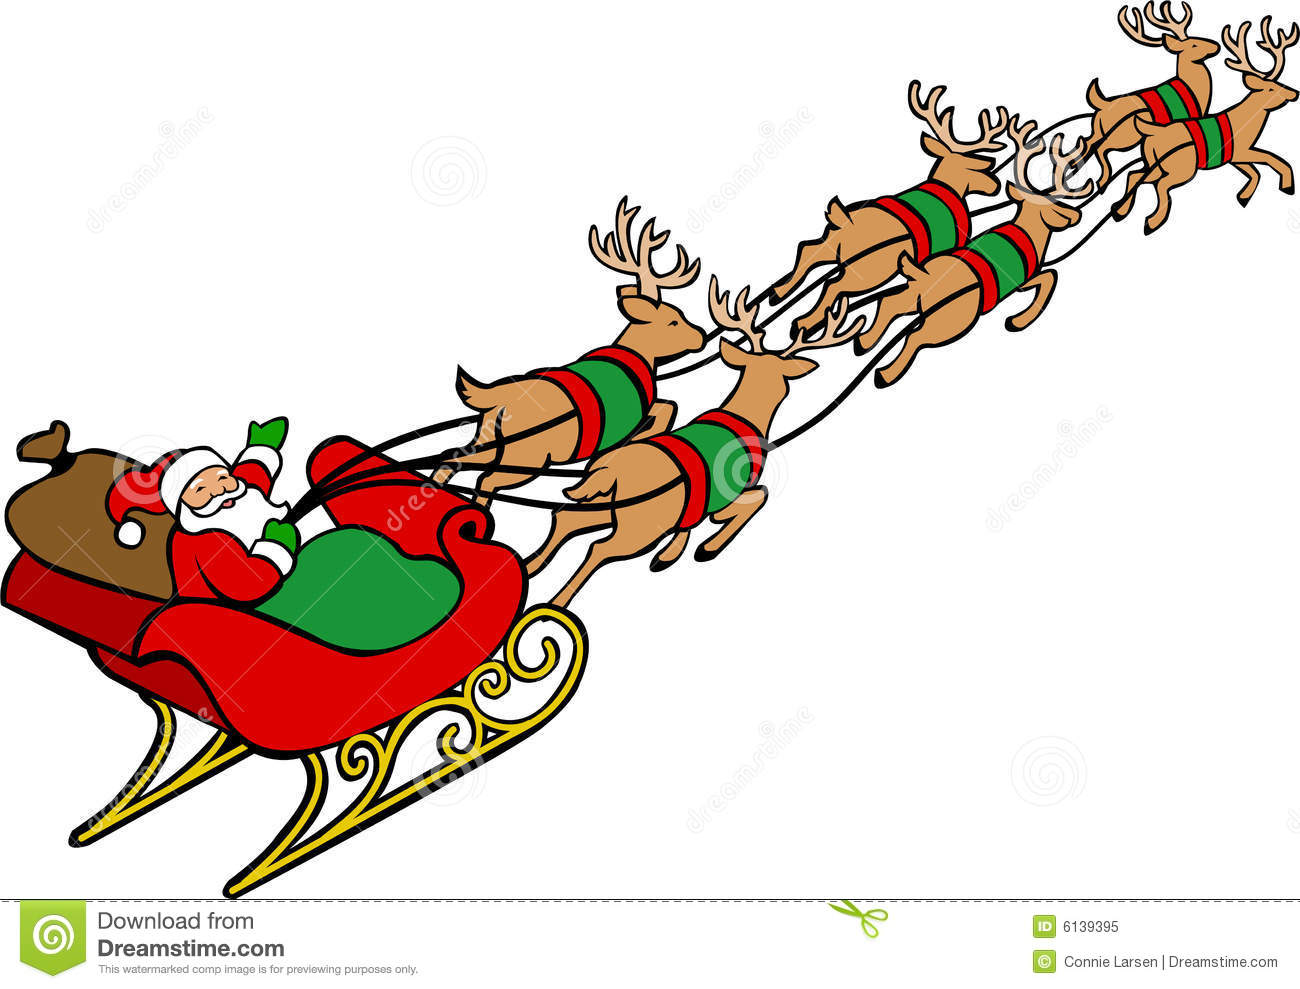 santa sleigh clipart at getdrawings com free for personal use rh getdrawings com santa sleigh clipart black and white santa sleigh clipart free